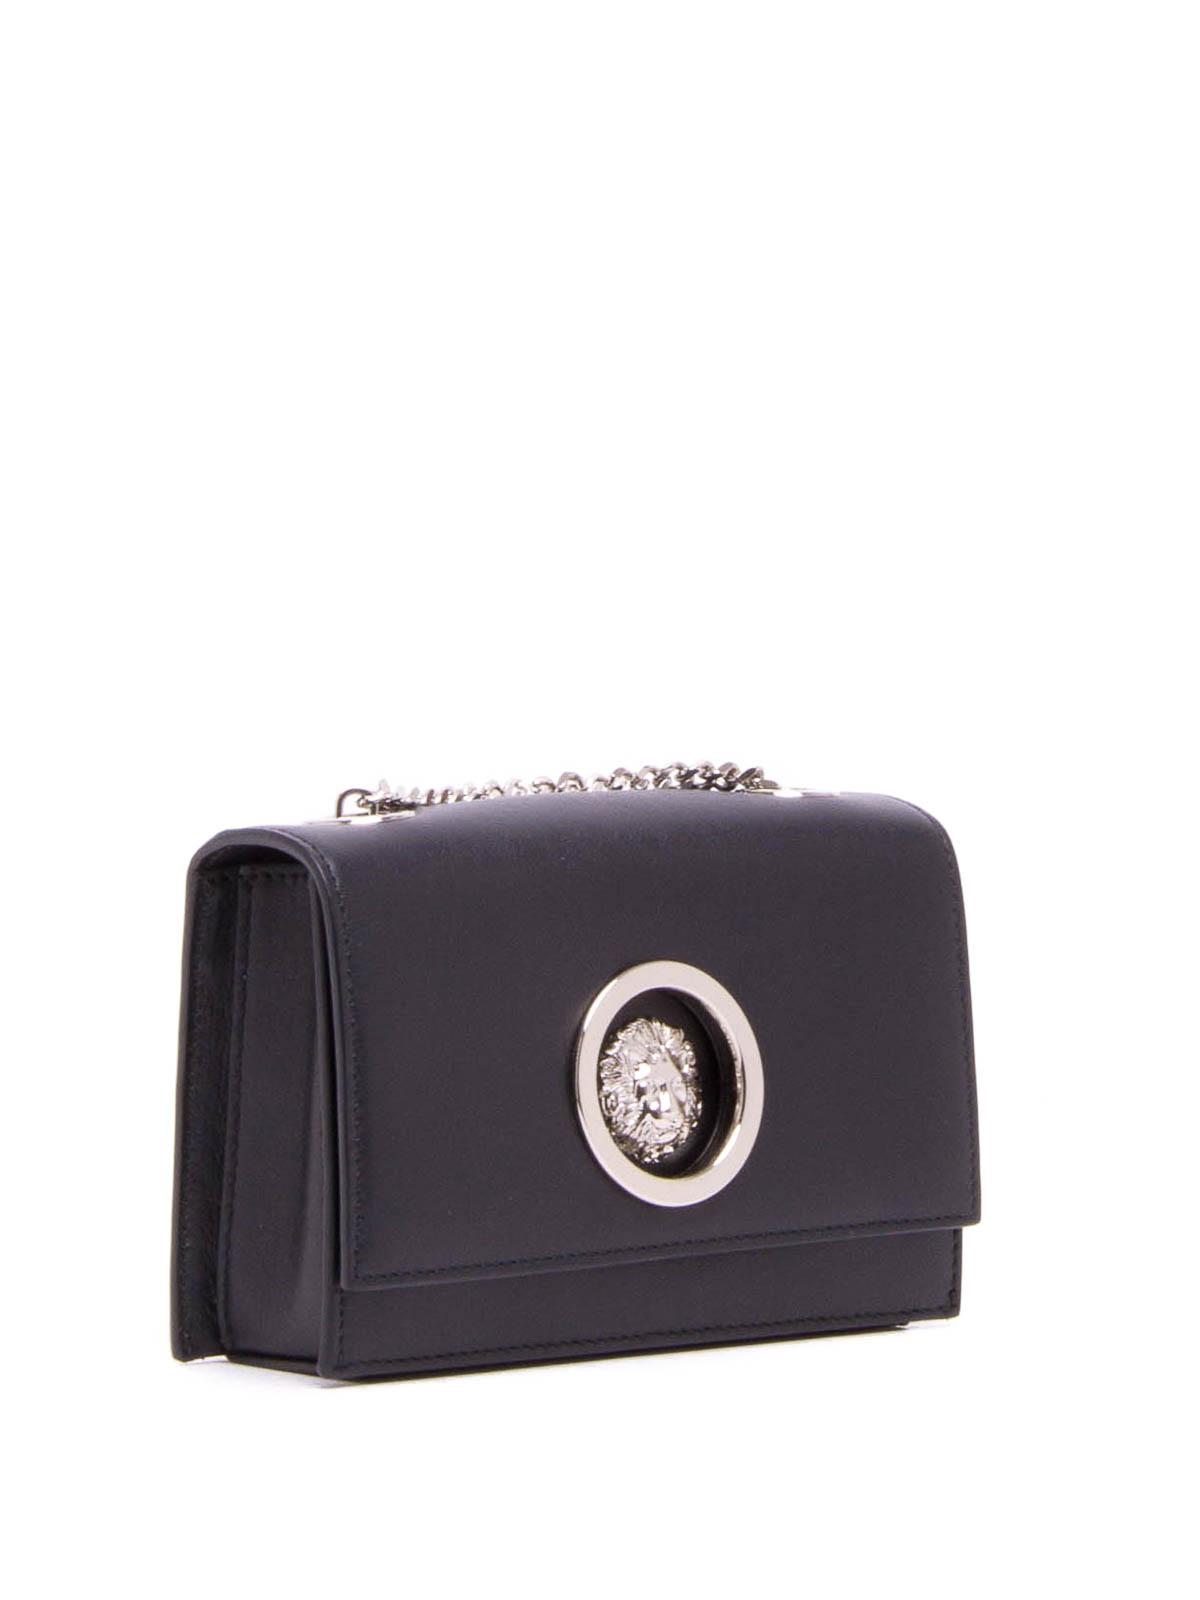 b7580943b2 Versus Versace  cross body bags online - Embellished crossbody bag